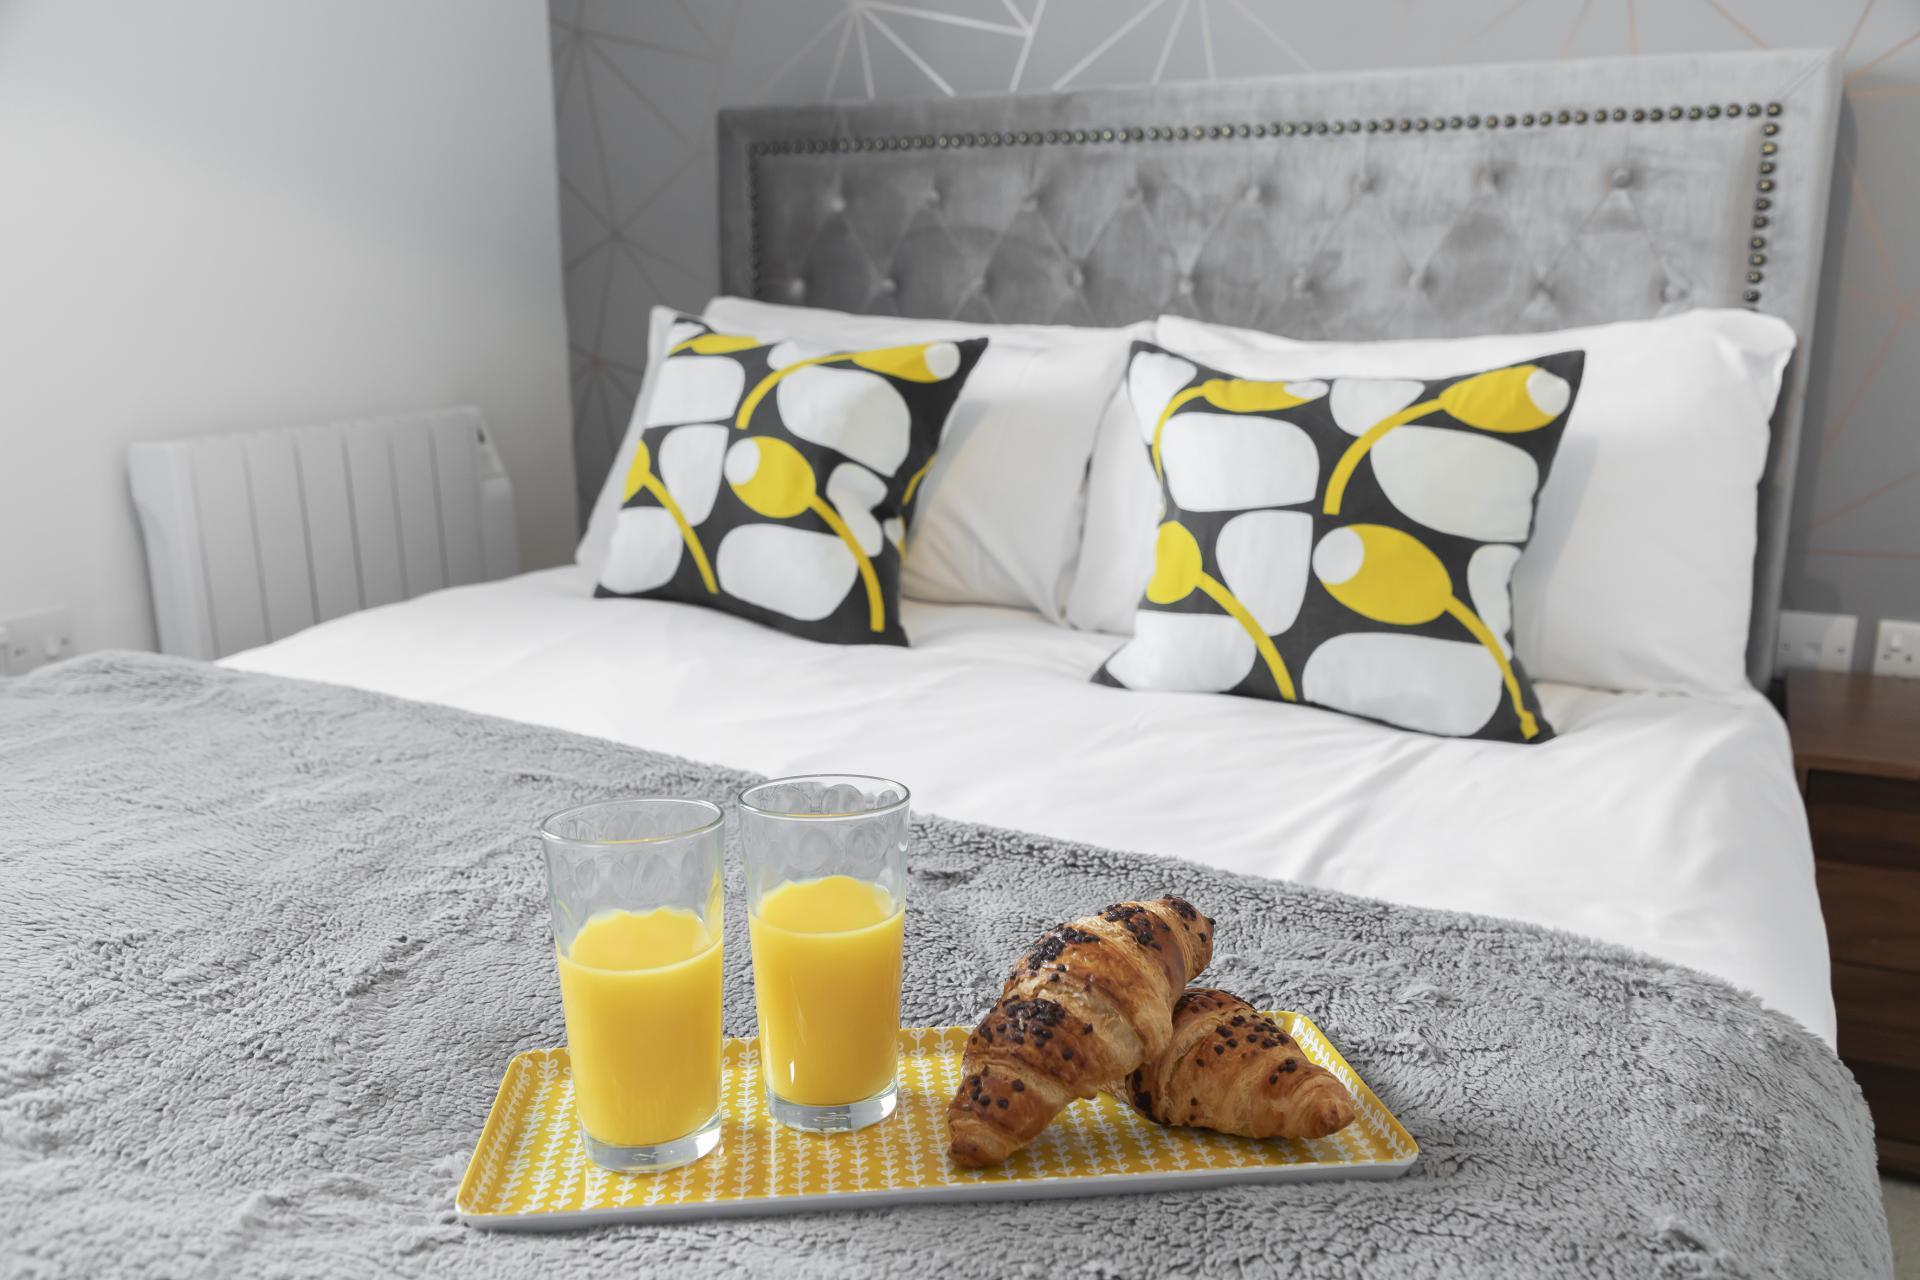 Double bed at Axiom No. 8 Apartment - Citybase Apartments